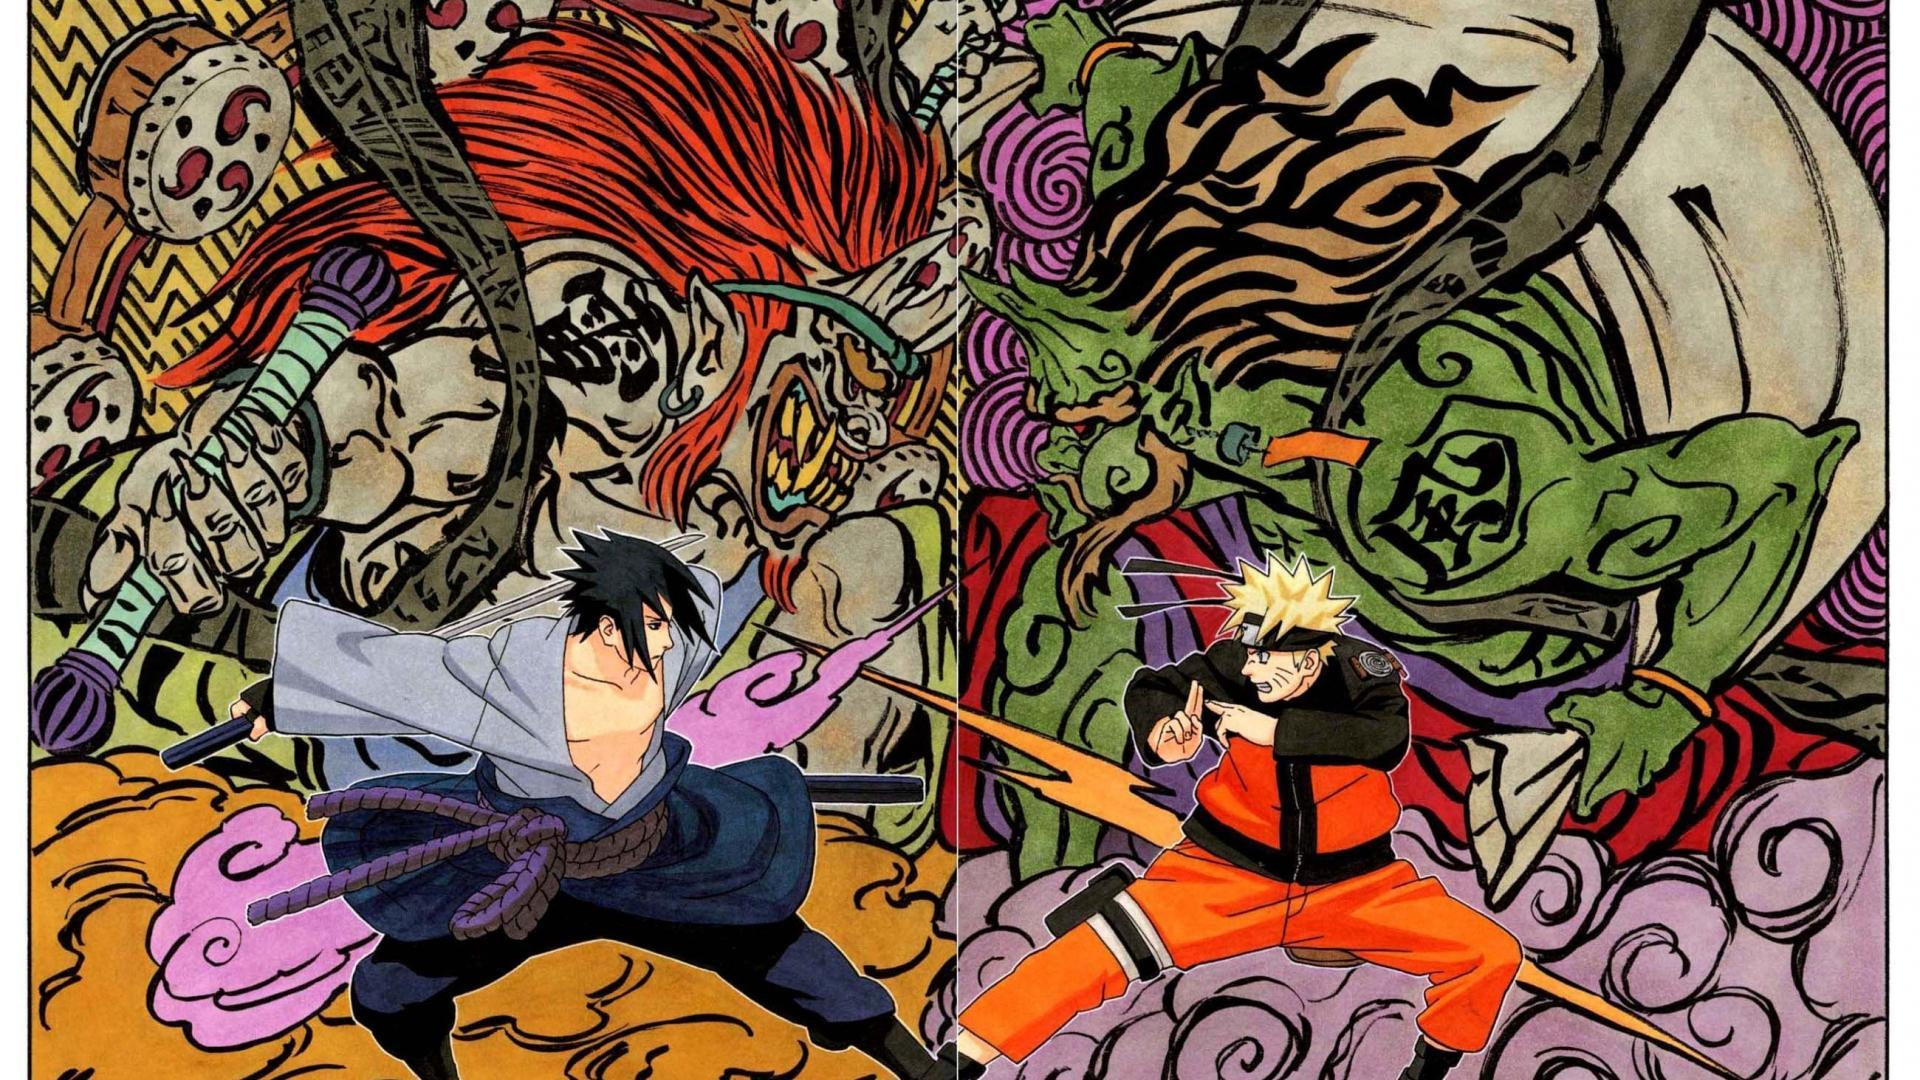 Naruto Shippuden Manga Wallpapers - Wallpaper Cave